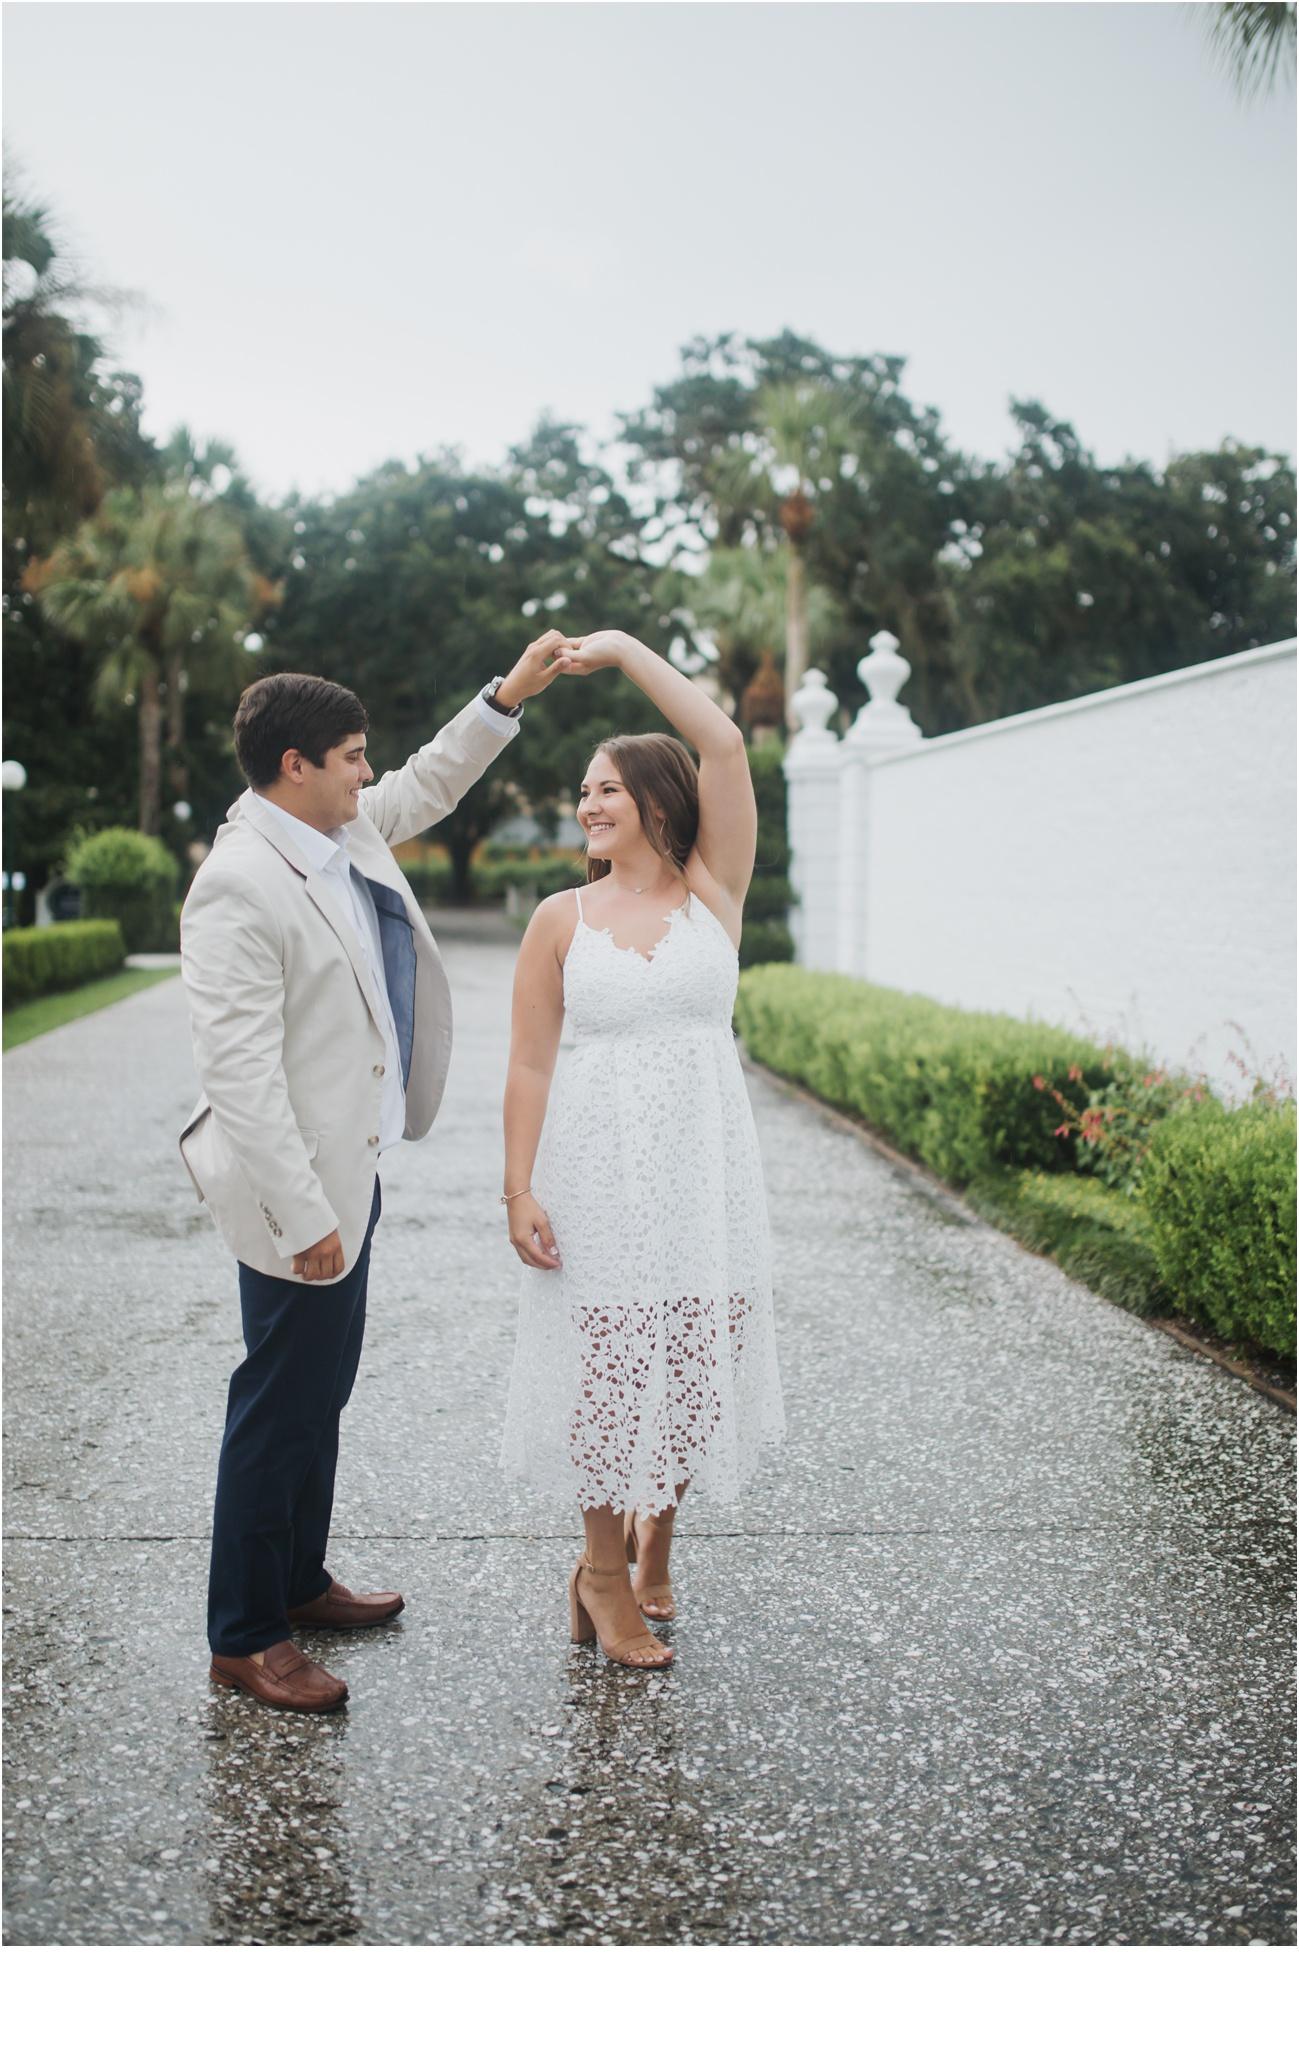 Rainey_Gregg_Photography_St._Simons_Island_Georgia_California_Wedding_Portrait_Photography_1123.jpg